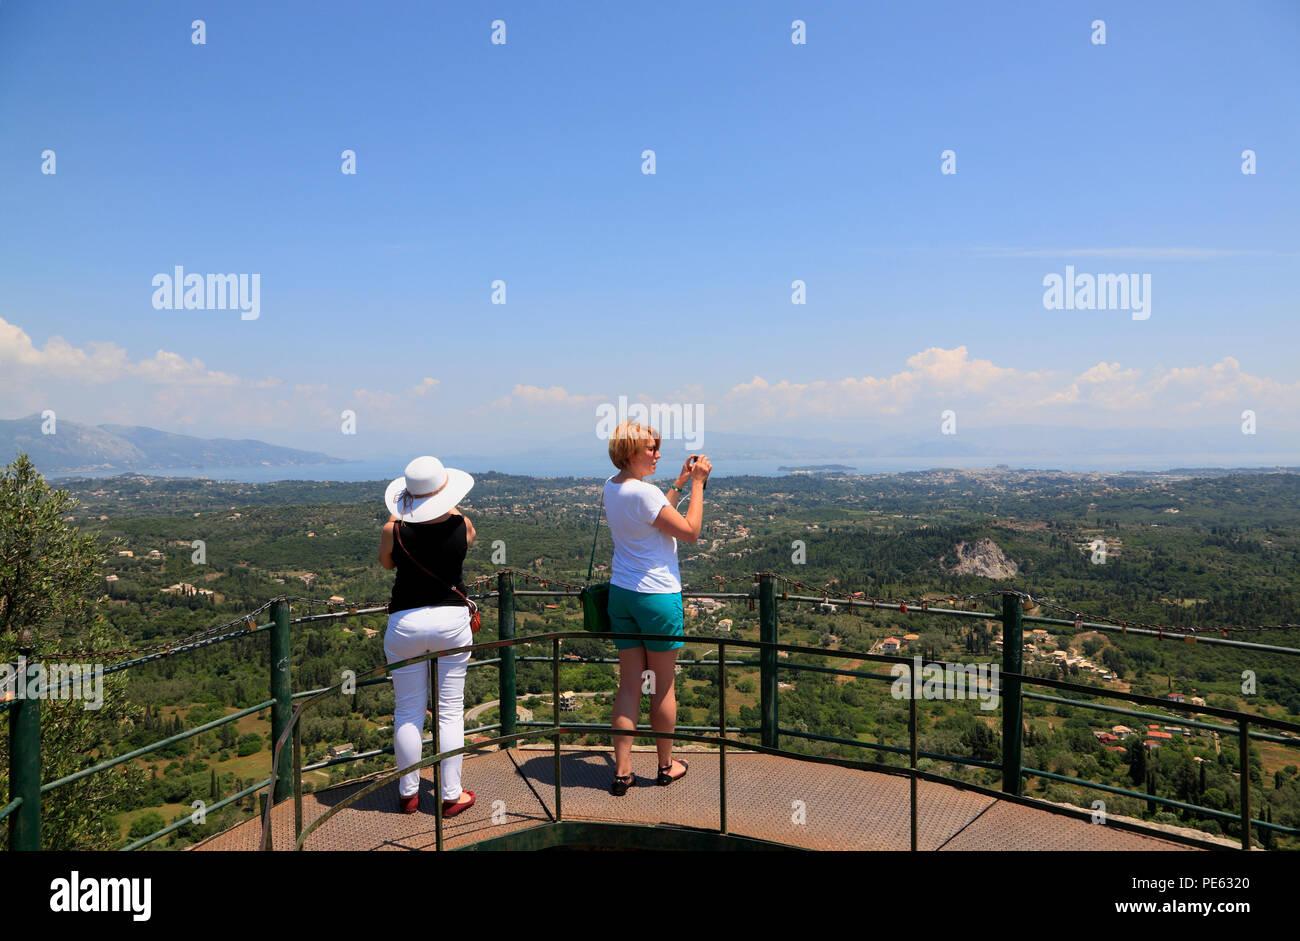 Outlook Kaisers Throne, Pelekas, Corfu, Greece, Europe - Stock Image